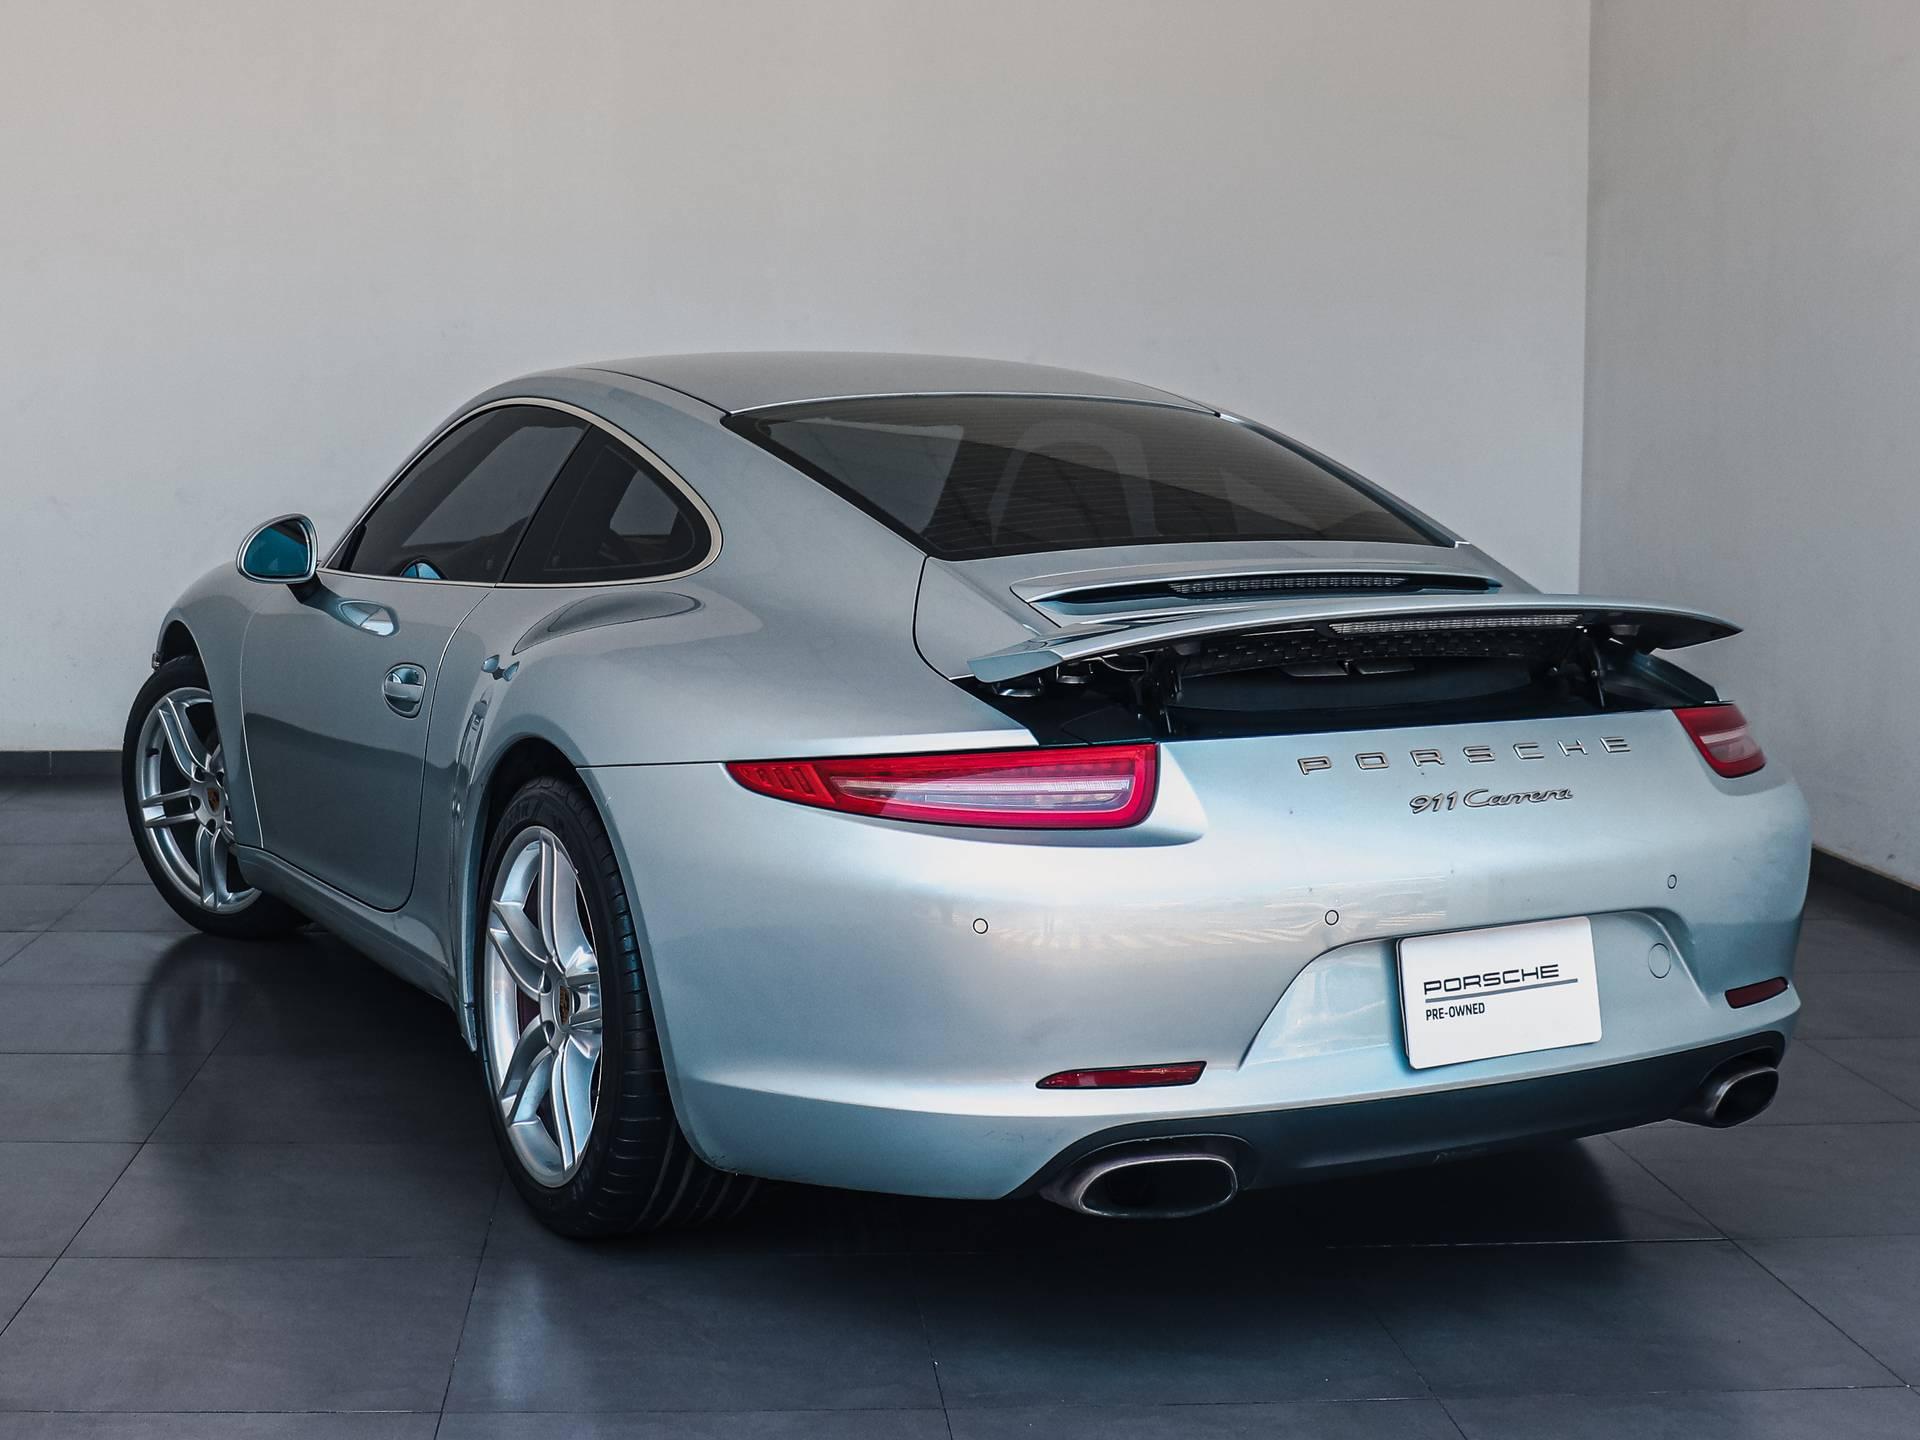 2014 Porsche 911 Carrera – 3